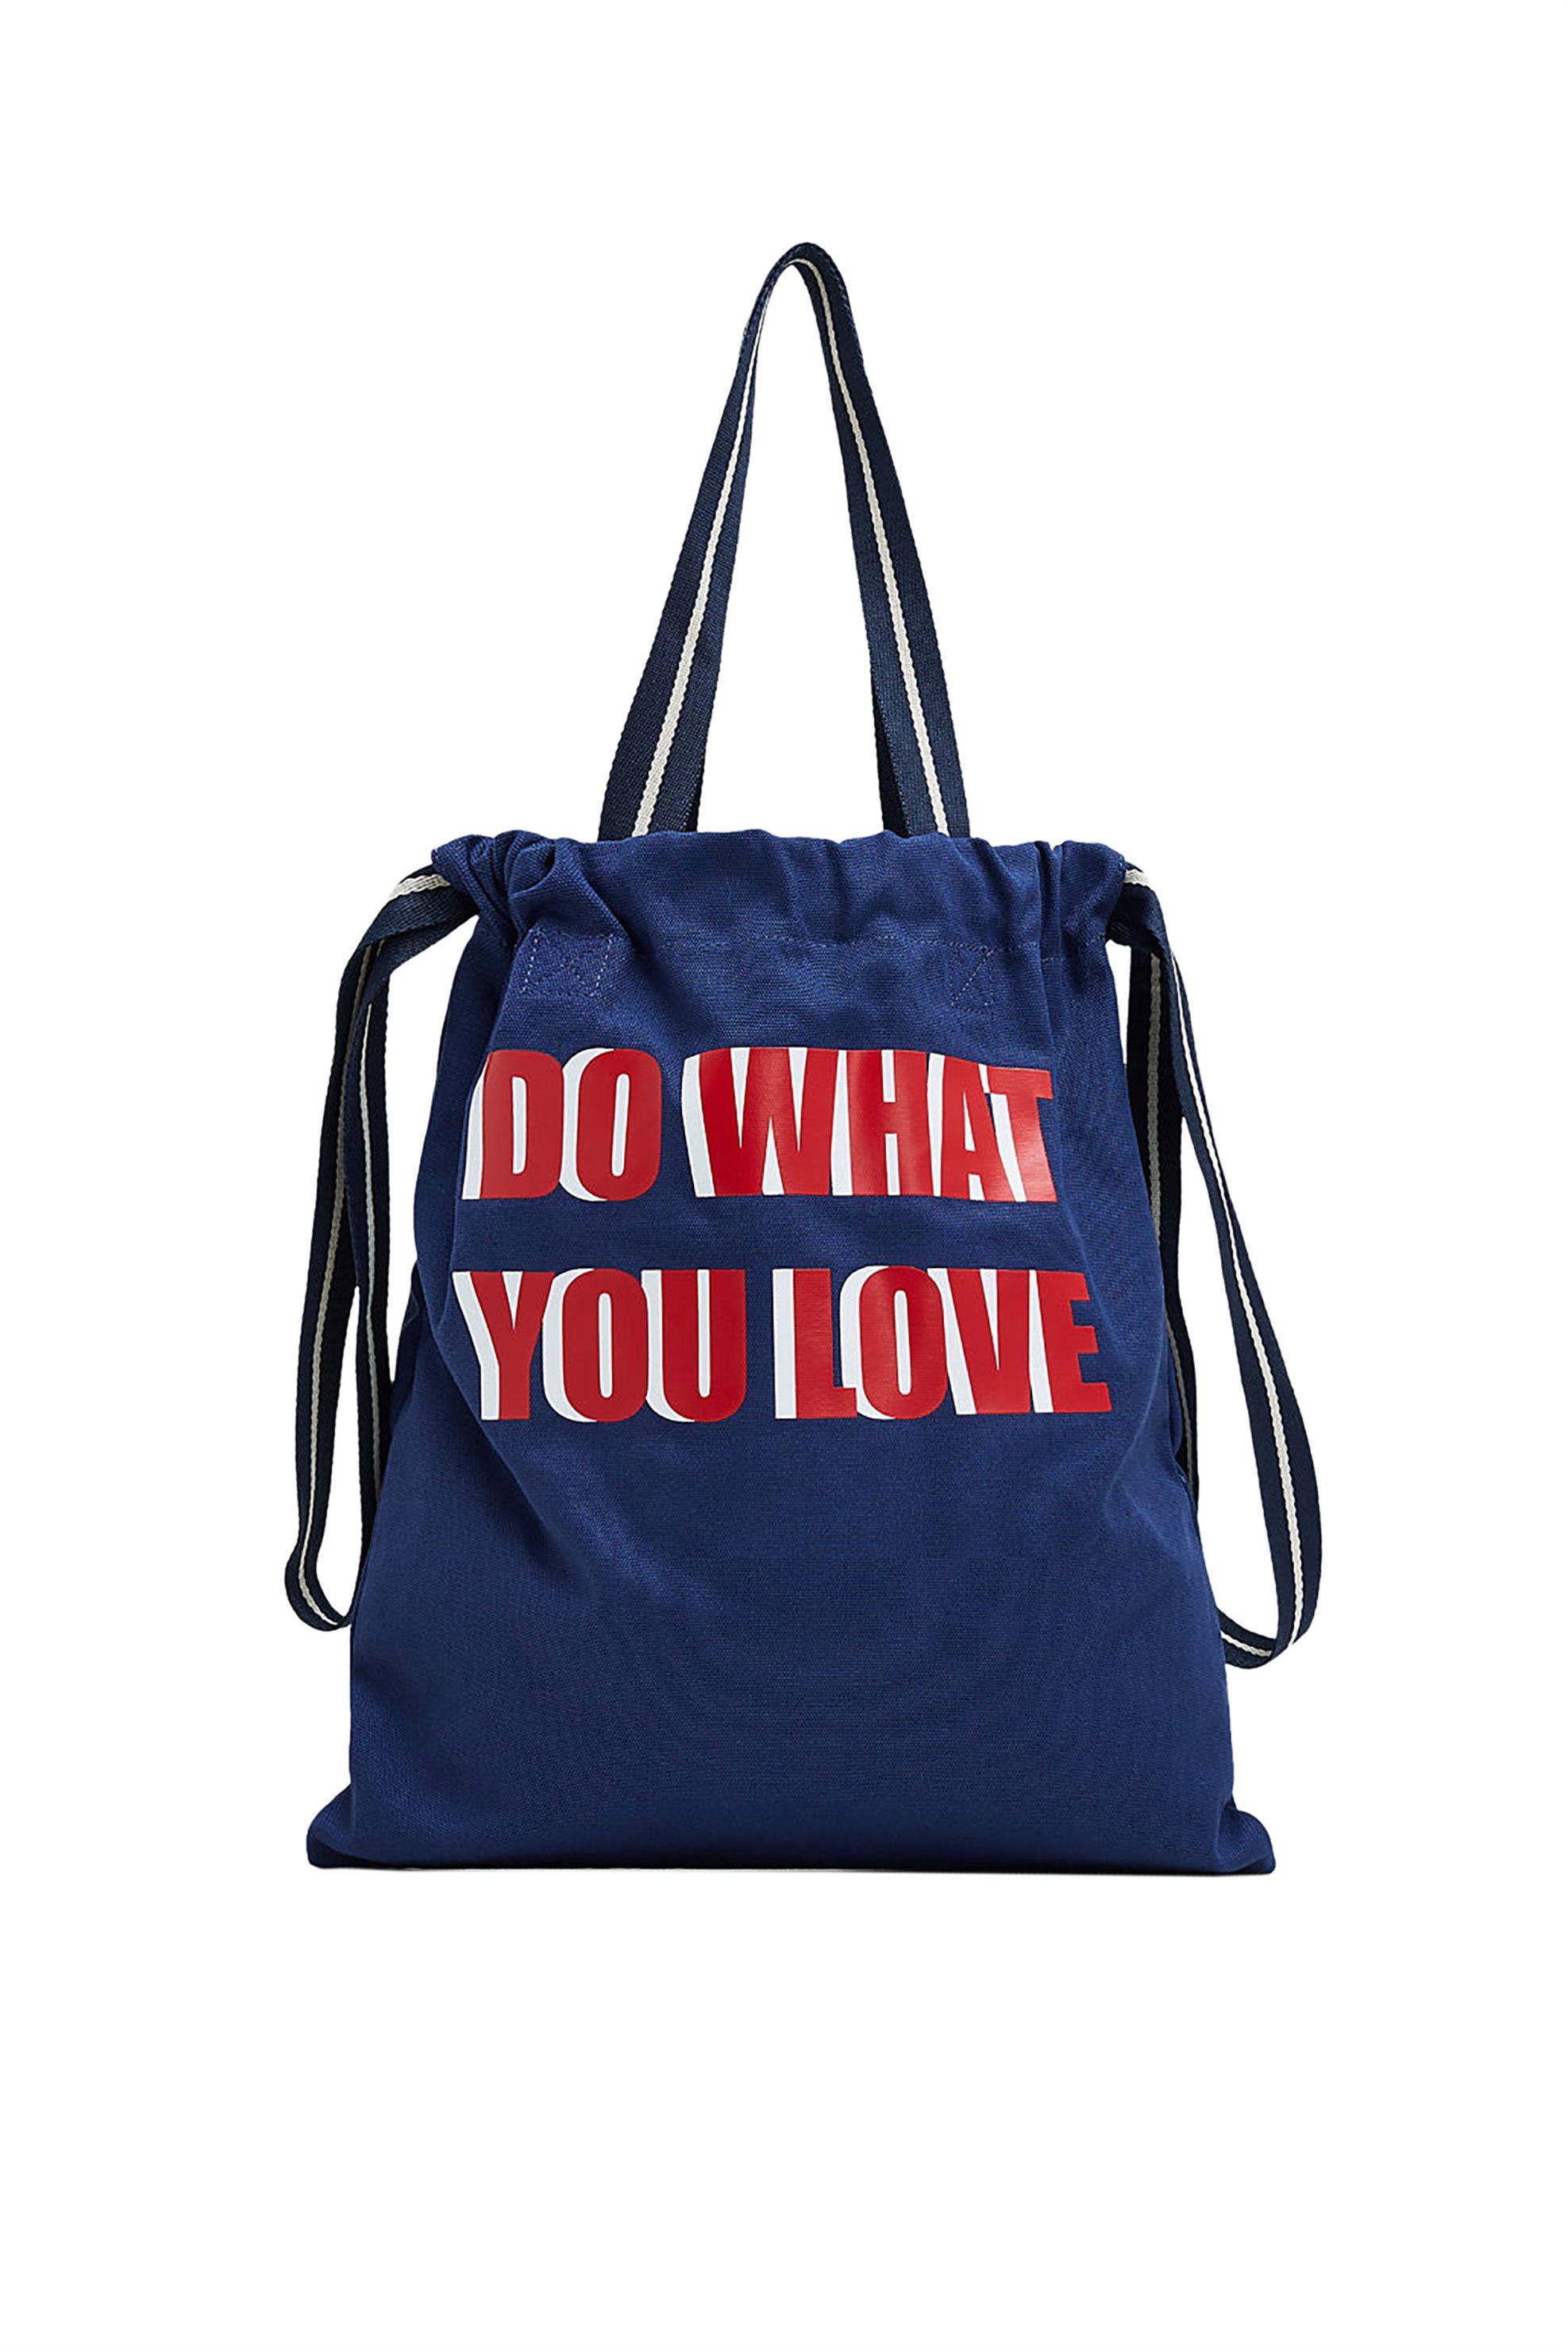 Esprit γυναικεία shopper τσάντα Canvas - 029EA1O035 - Μπλε Σκούρο γυναικα   τσαντεσ   ώμου   shopper bags